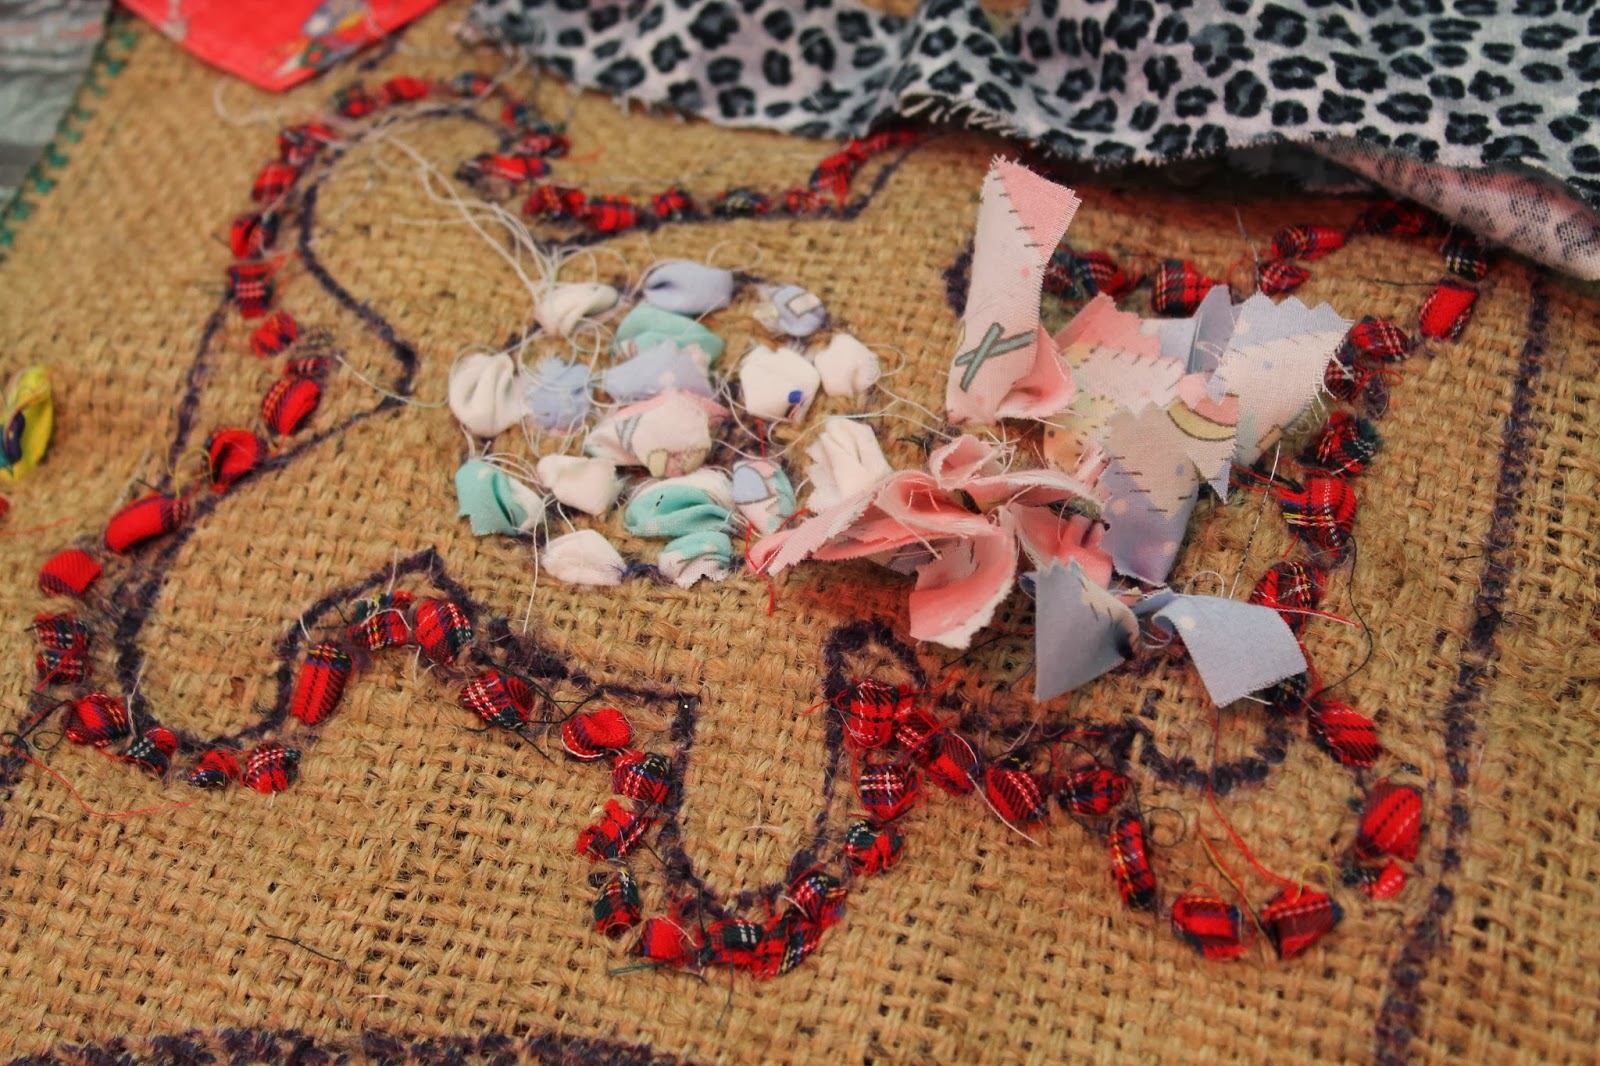 Knit Natter And Stitch New Bradwell : Knit, Natter & Stitch : Tidy, tidy, spick and span! Before.....